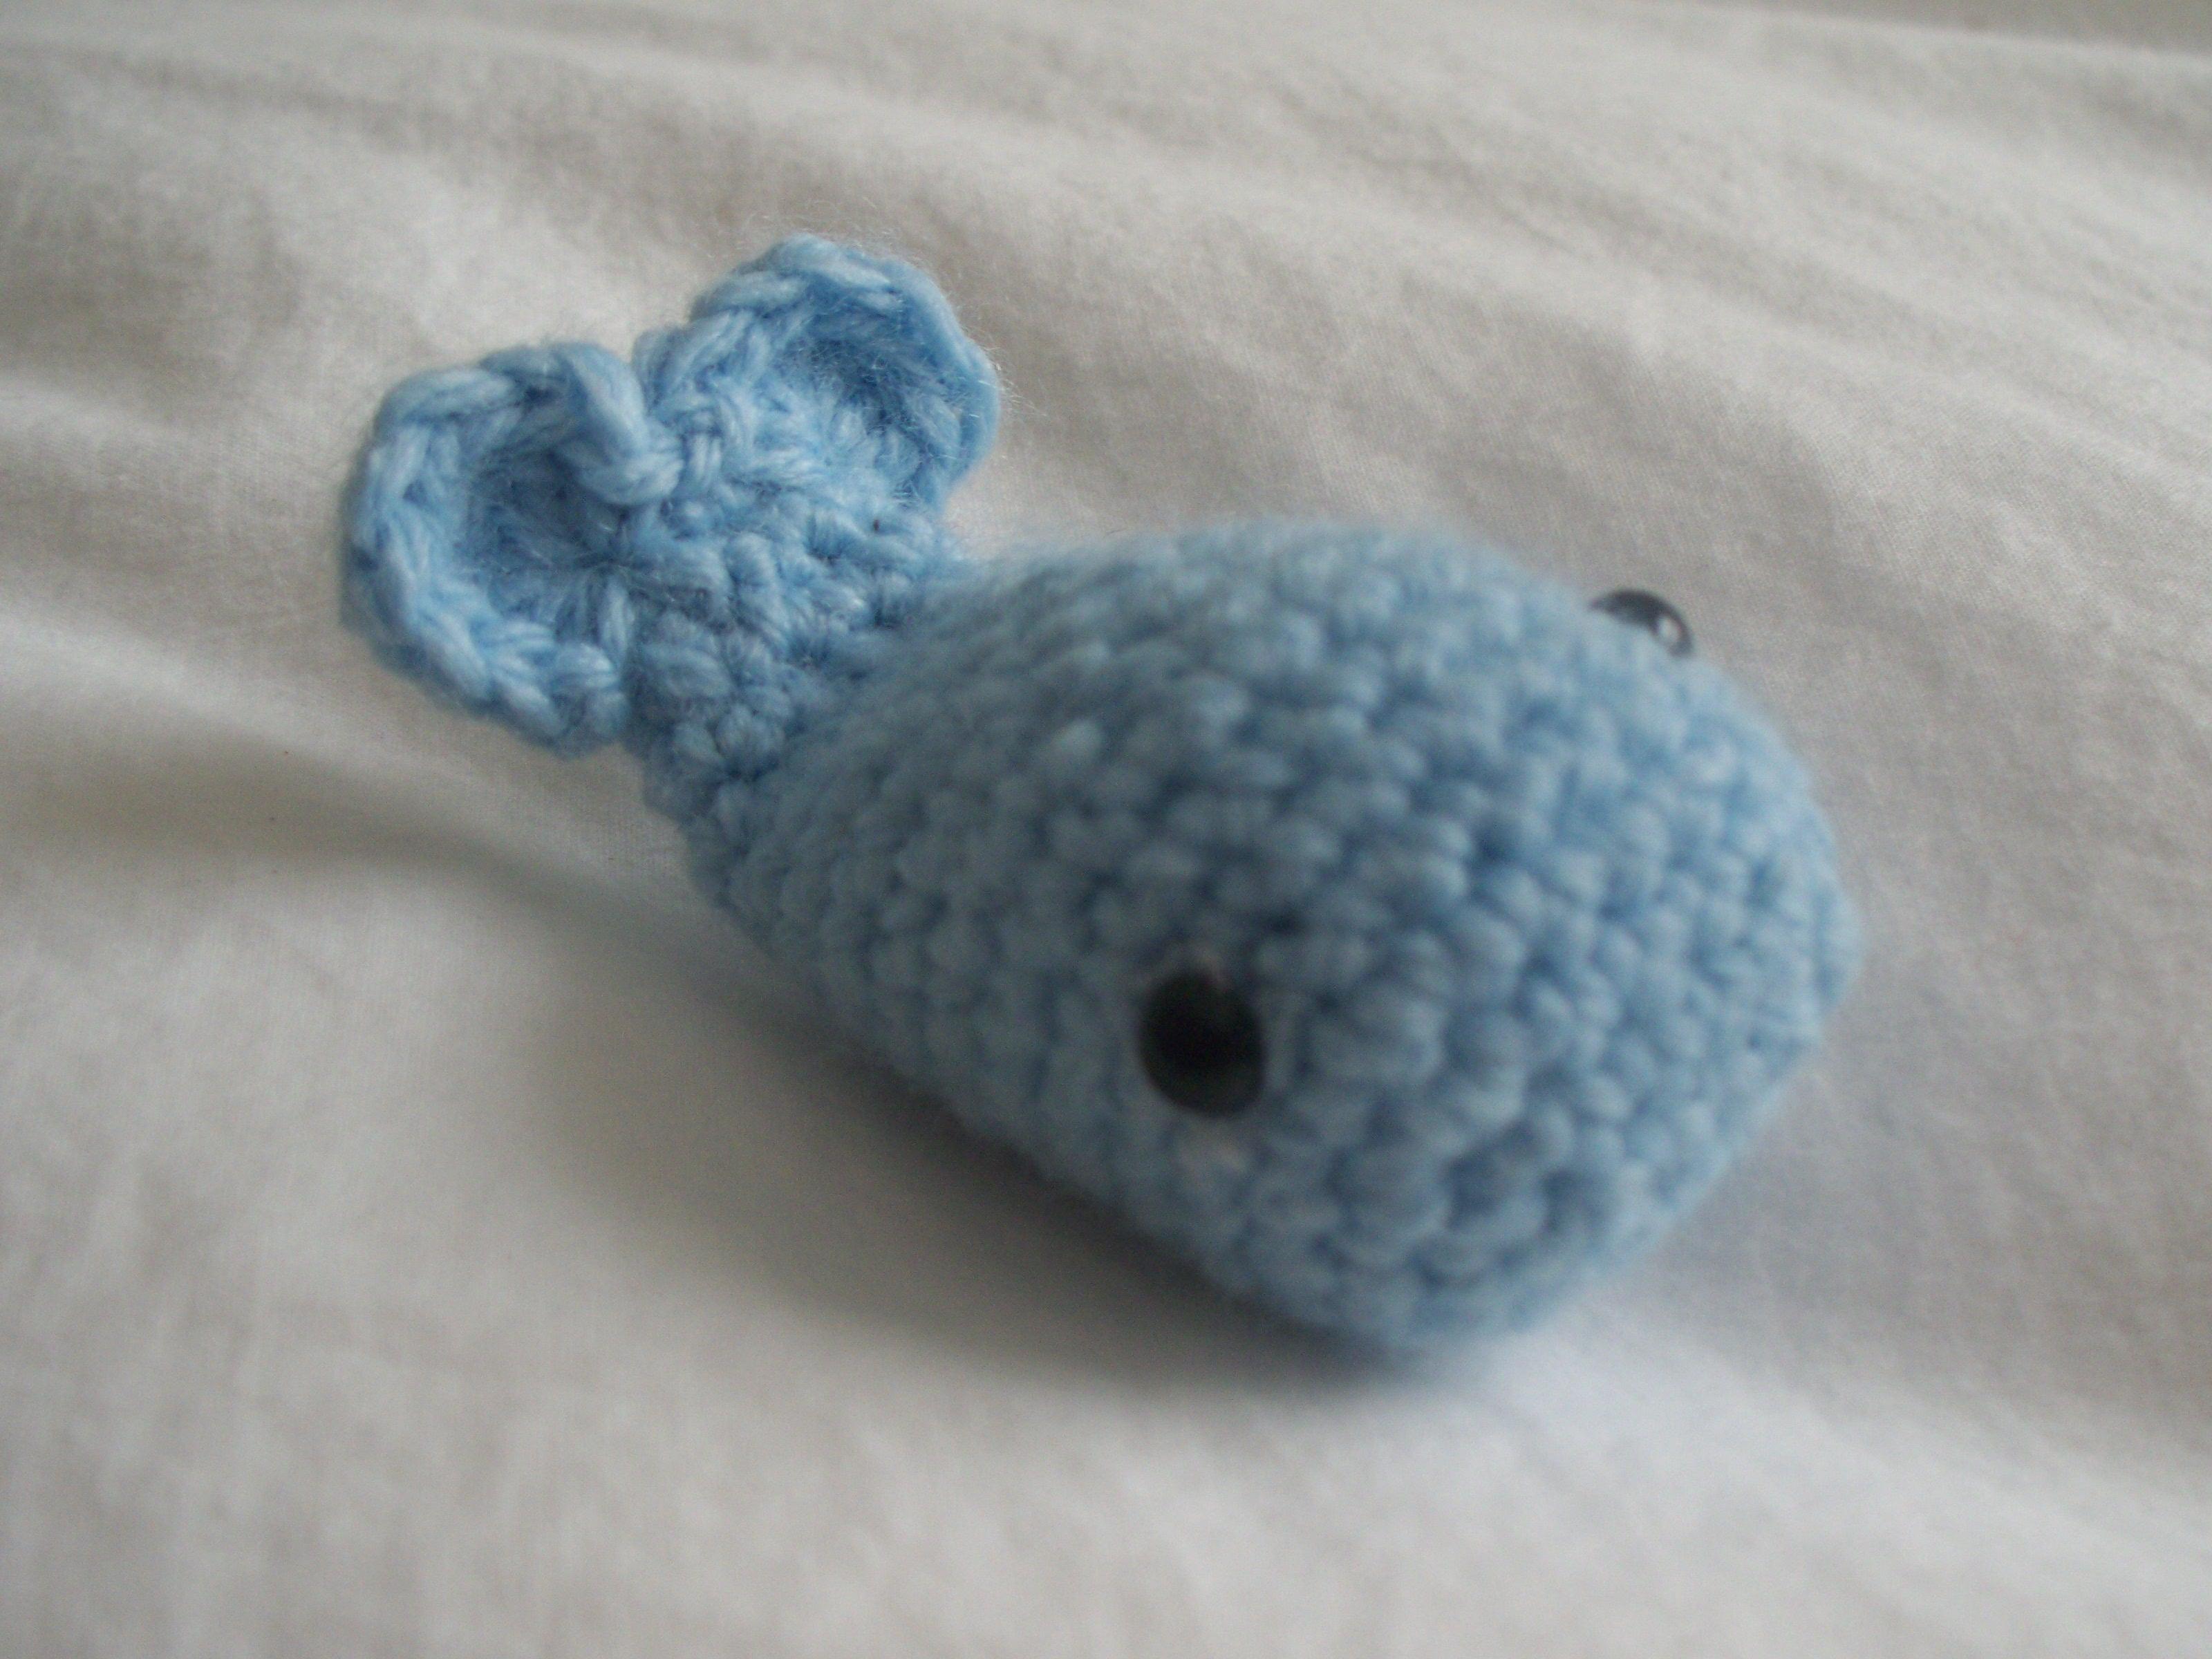 Whale Amigurumi Blue : Baby Blue Whale Amigurumi Flickr - Photo Sharing!